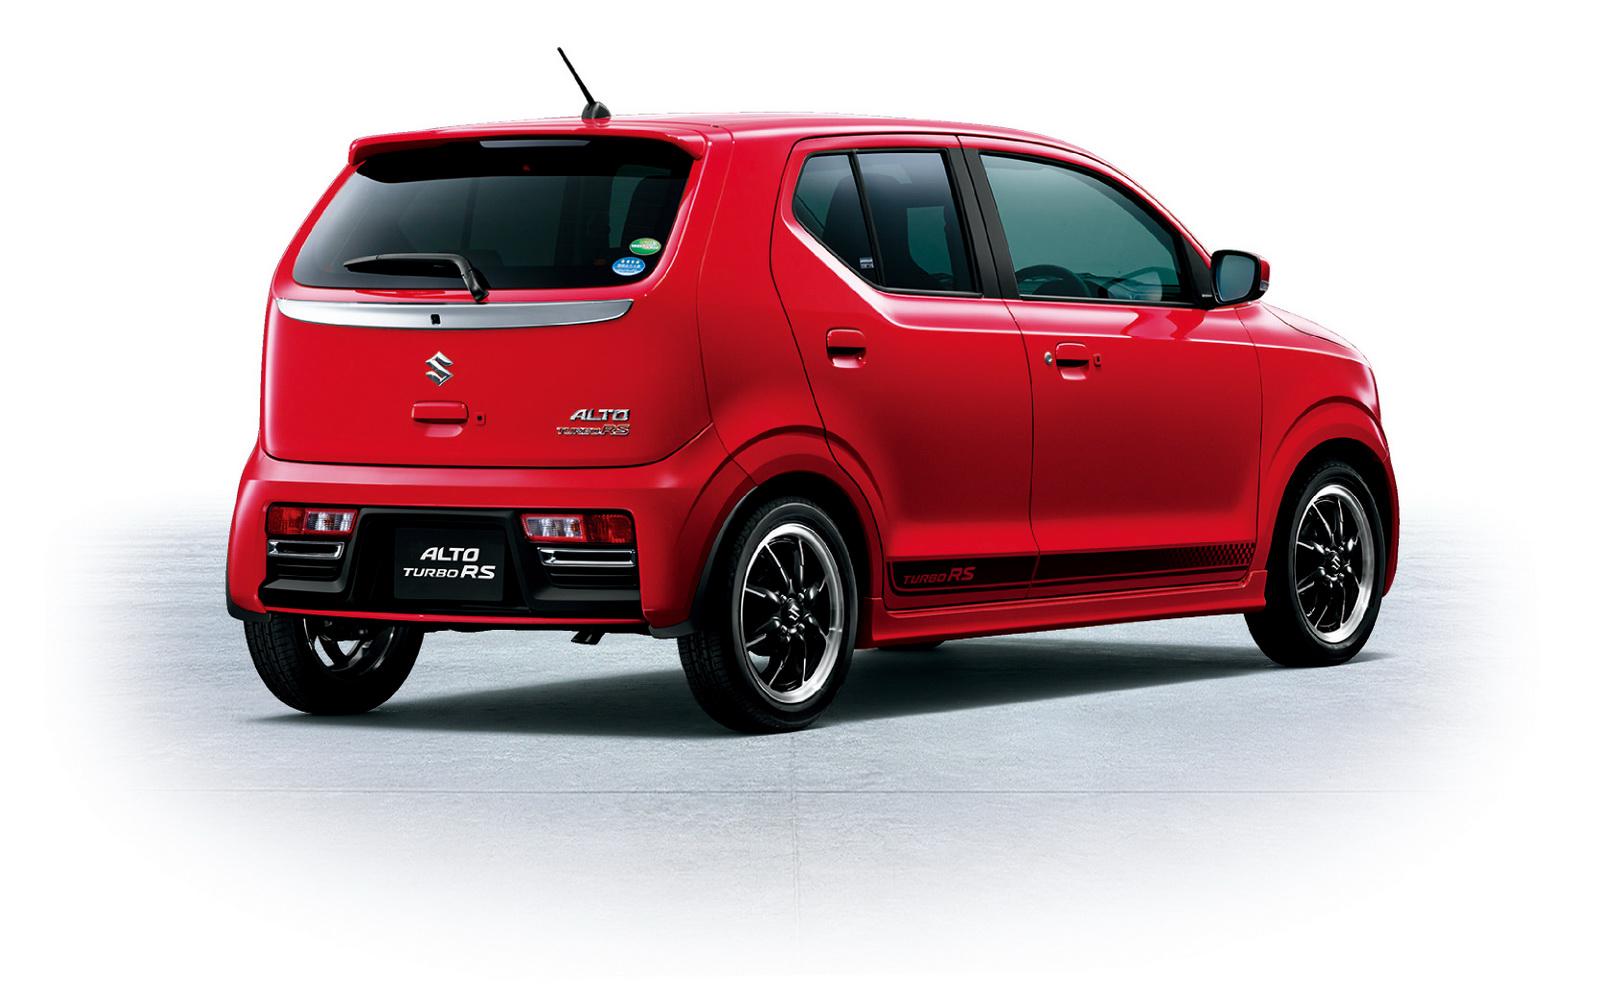 Suzuki Alto kei-car moze miec naped na 4 kola